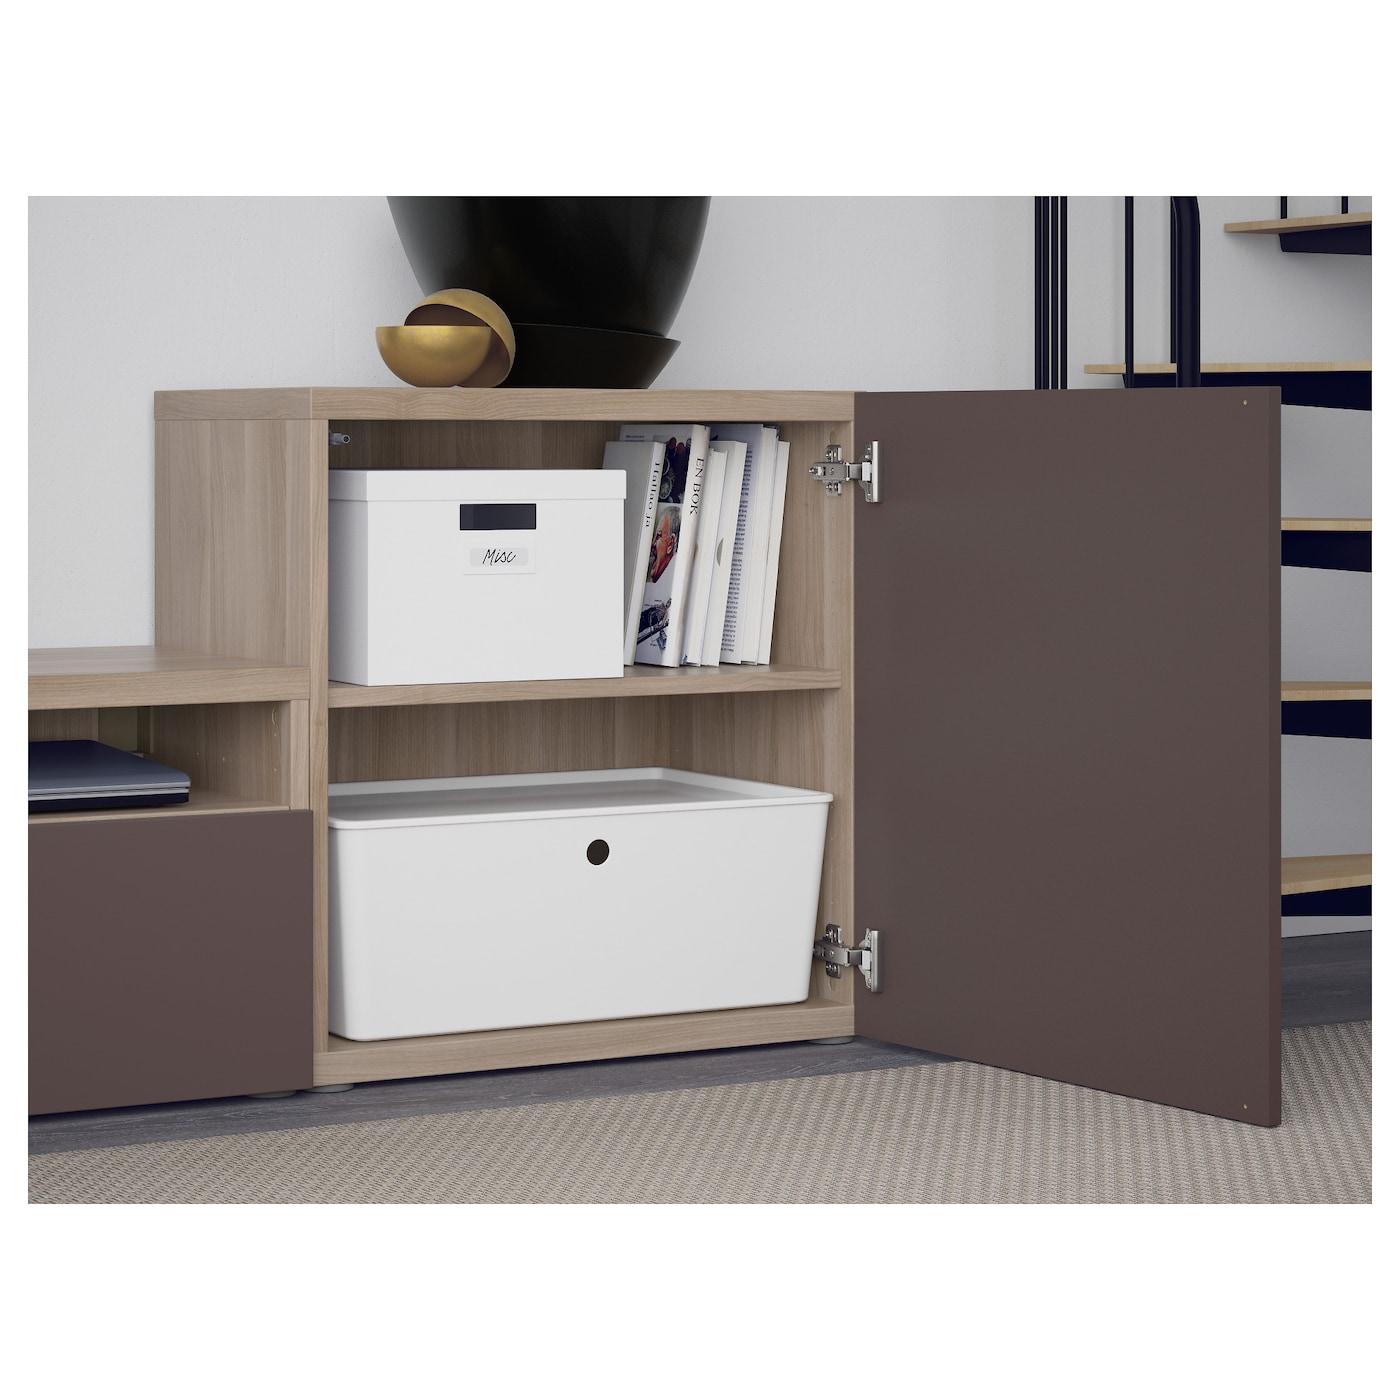 Best mueble tv con almacenaje efecto nogal tinte gris valviken vidrio transparente marr n 300 x - Muebles almacenaje ikea ...